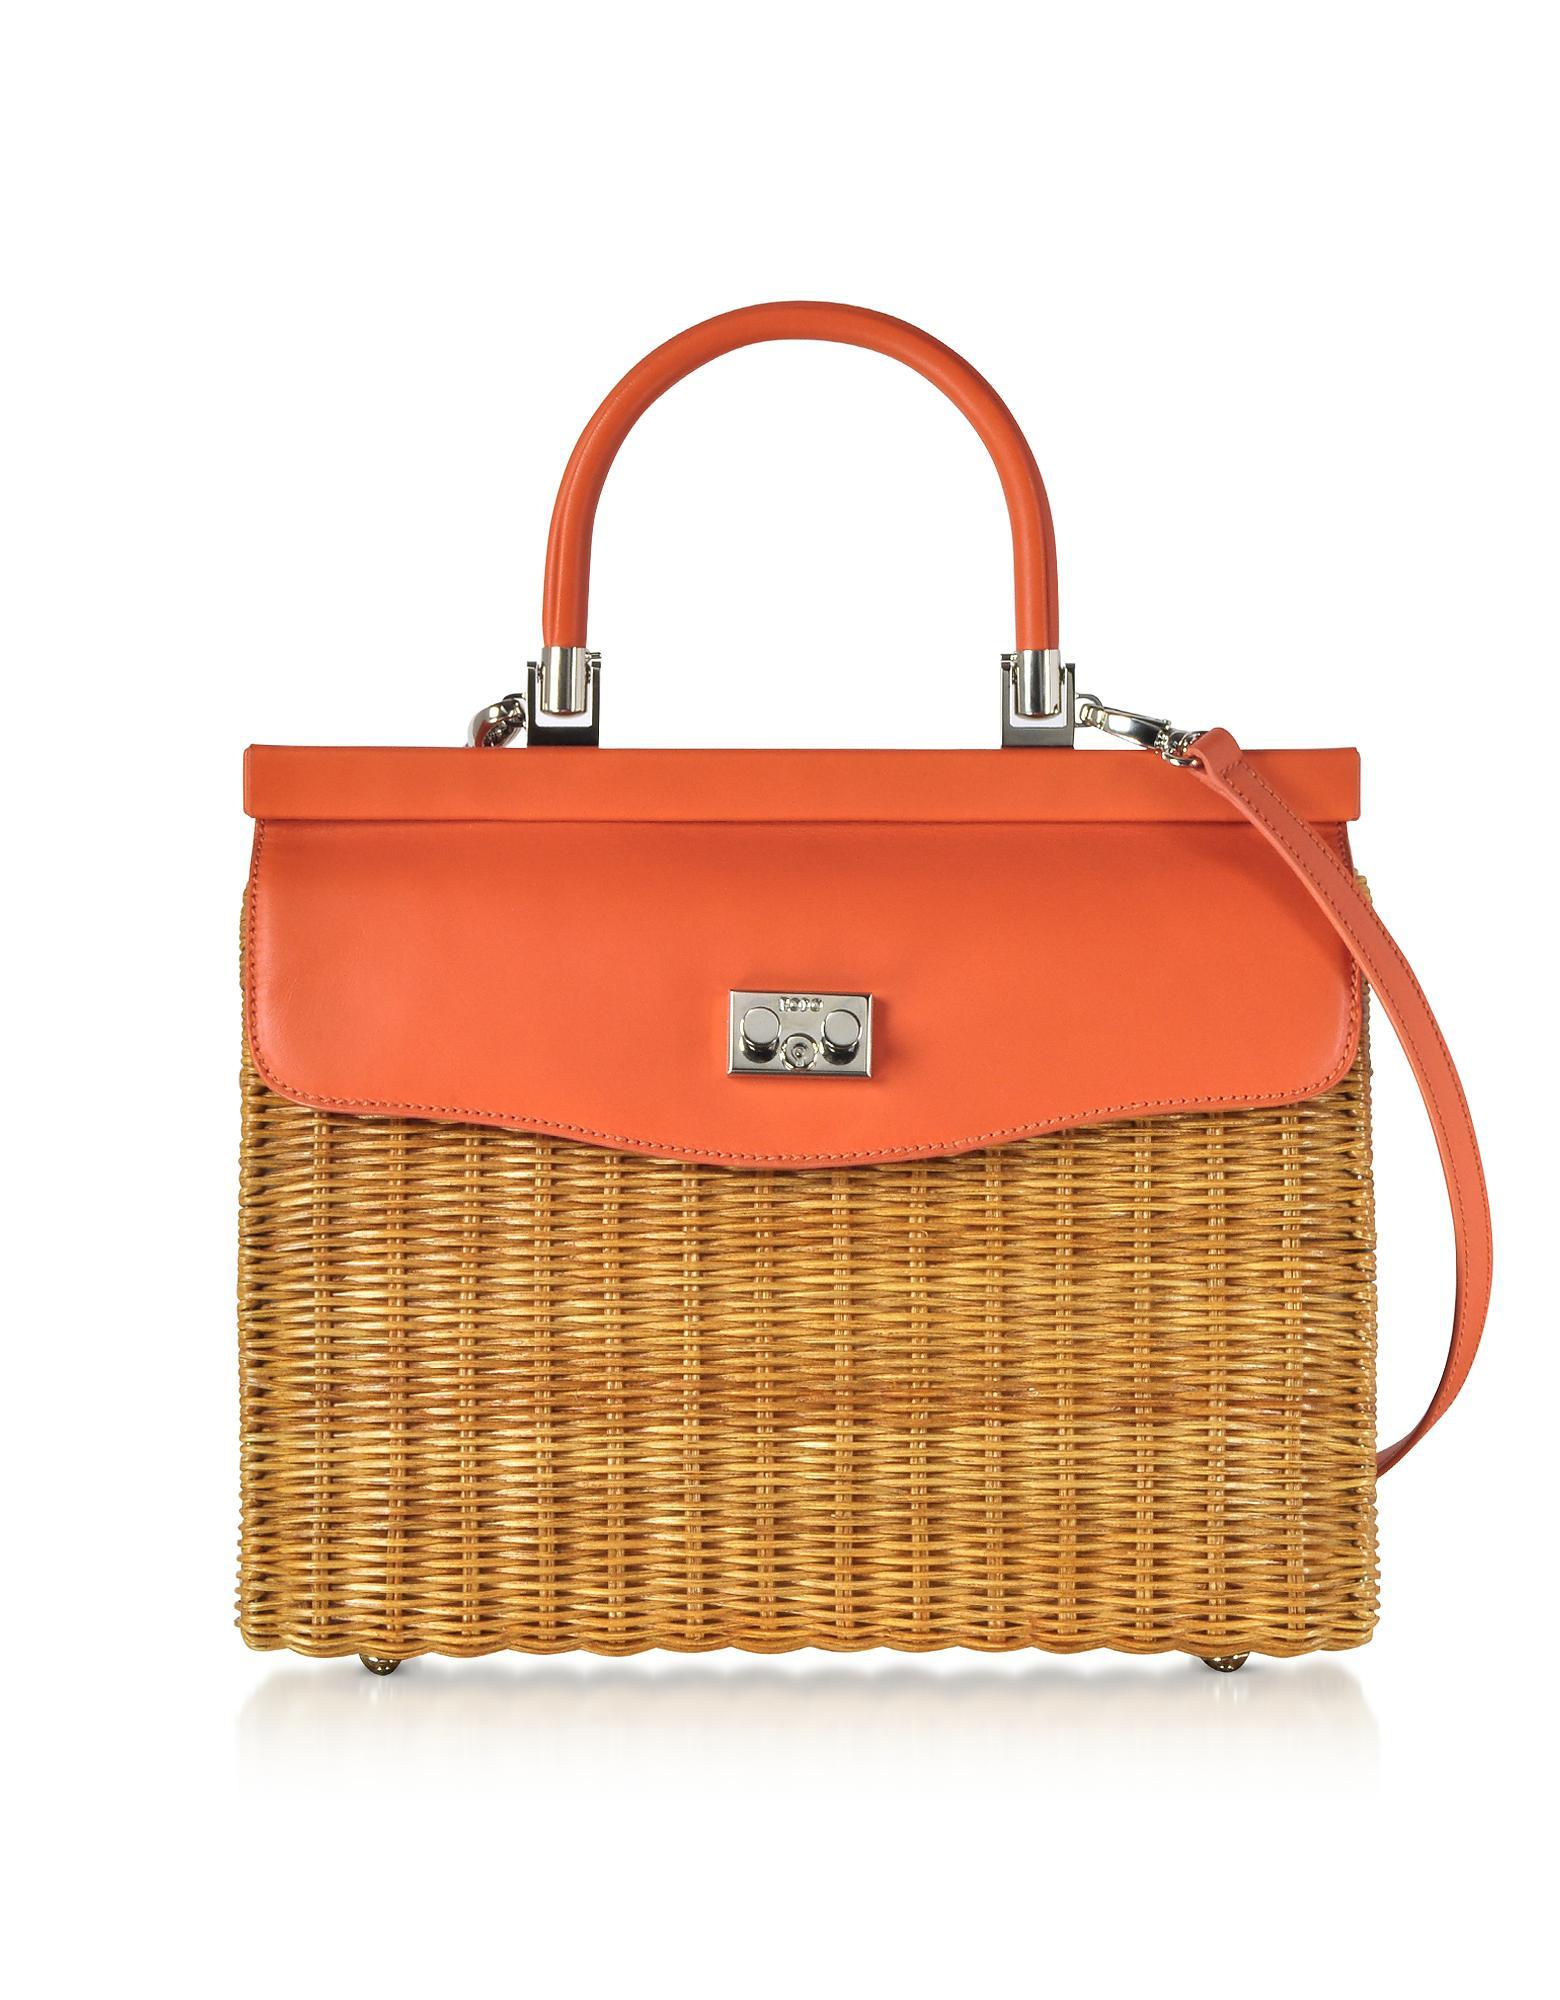 9c74e8726220e Rodo - Orange Large Leather And Wicker Midollina Satchel Bag - Lyst